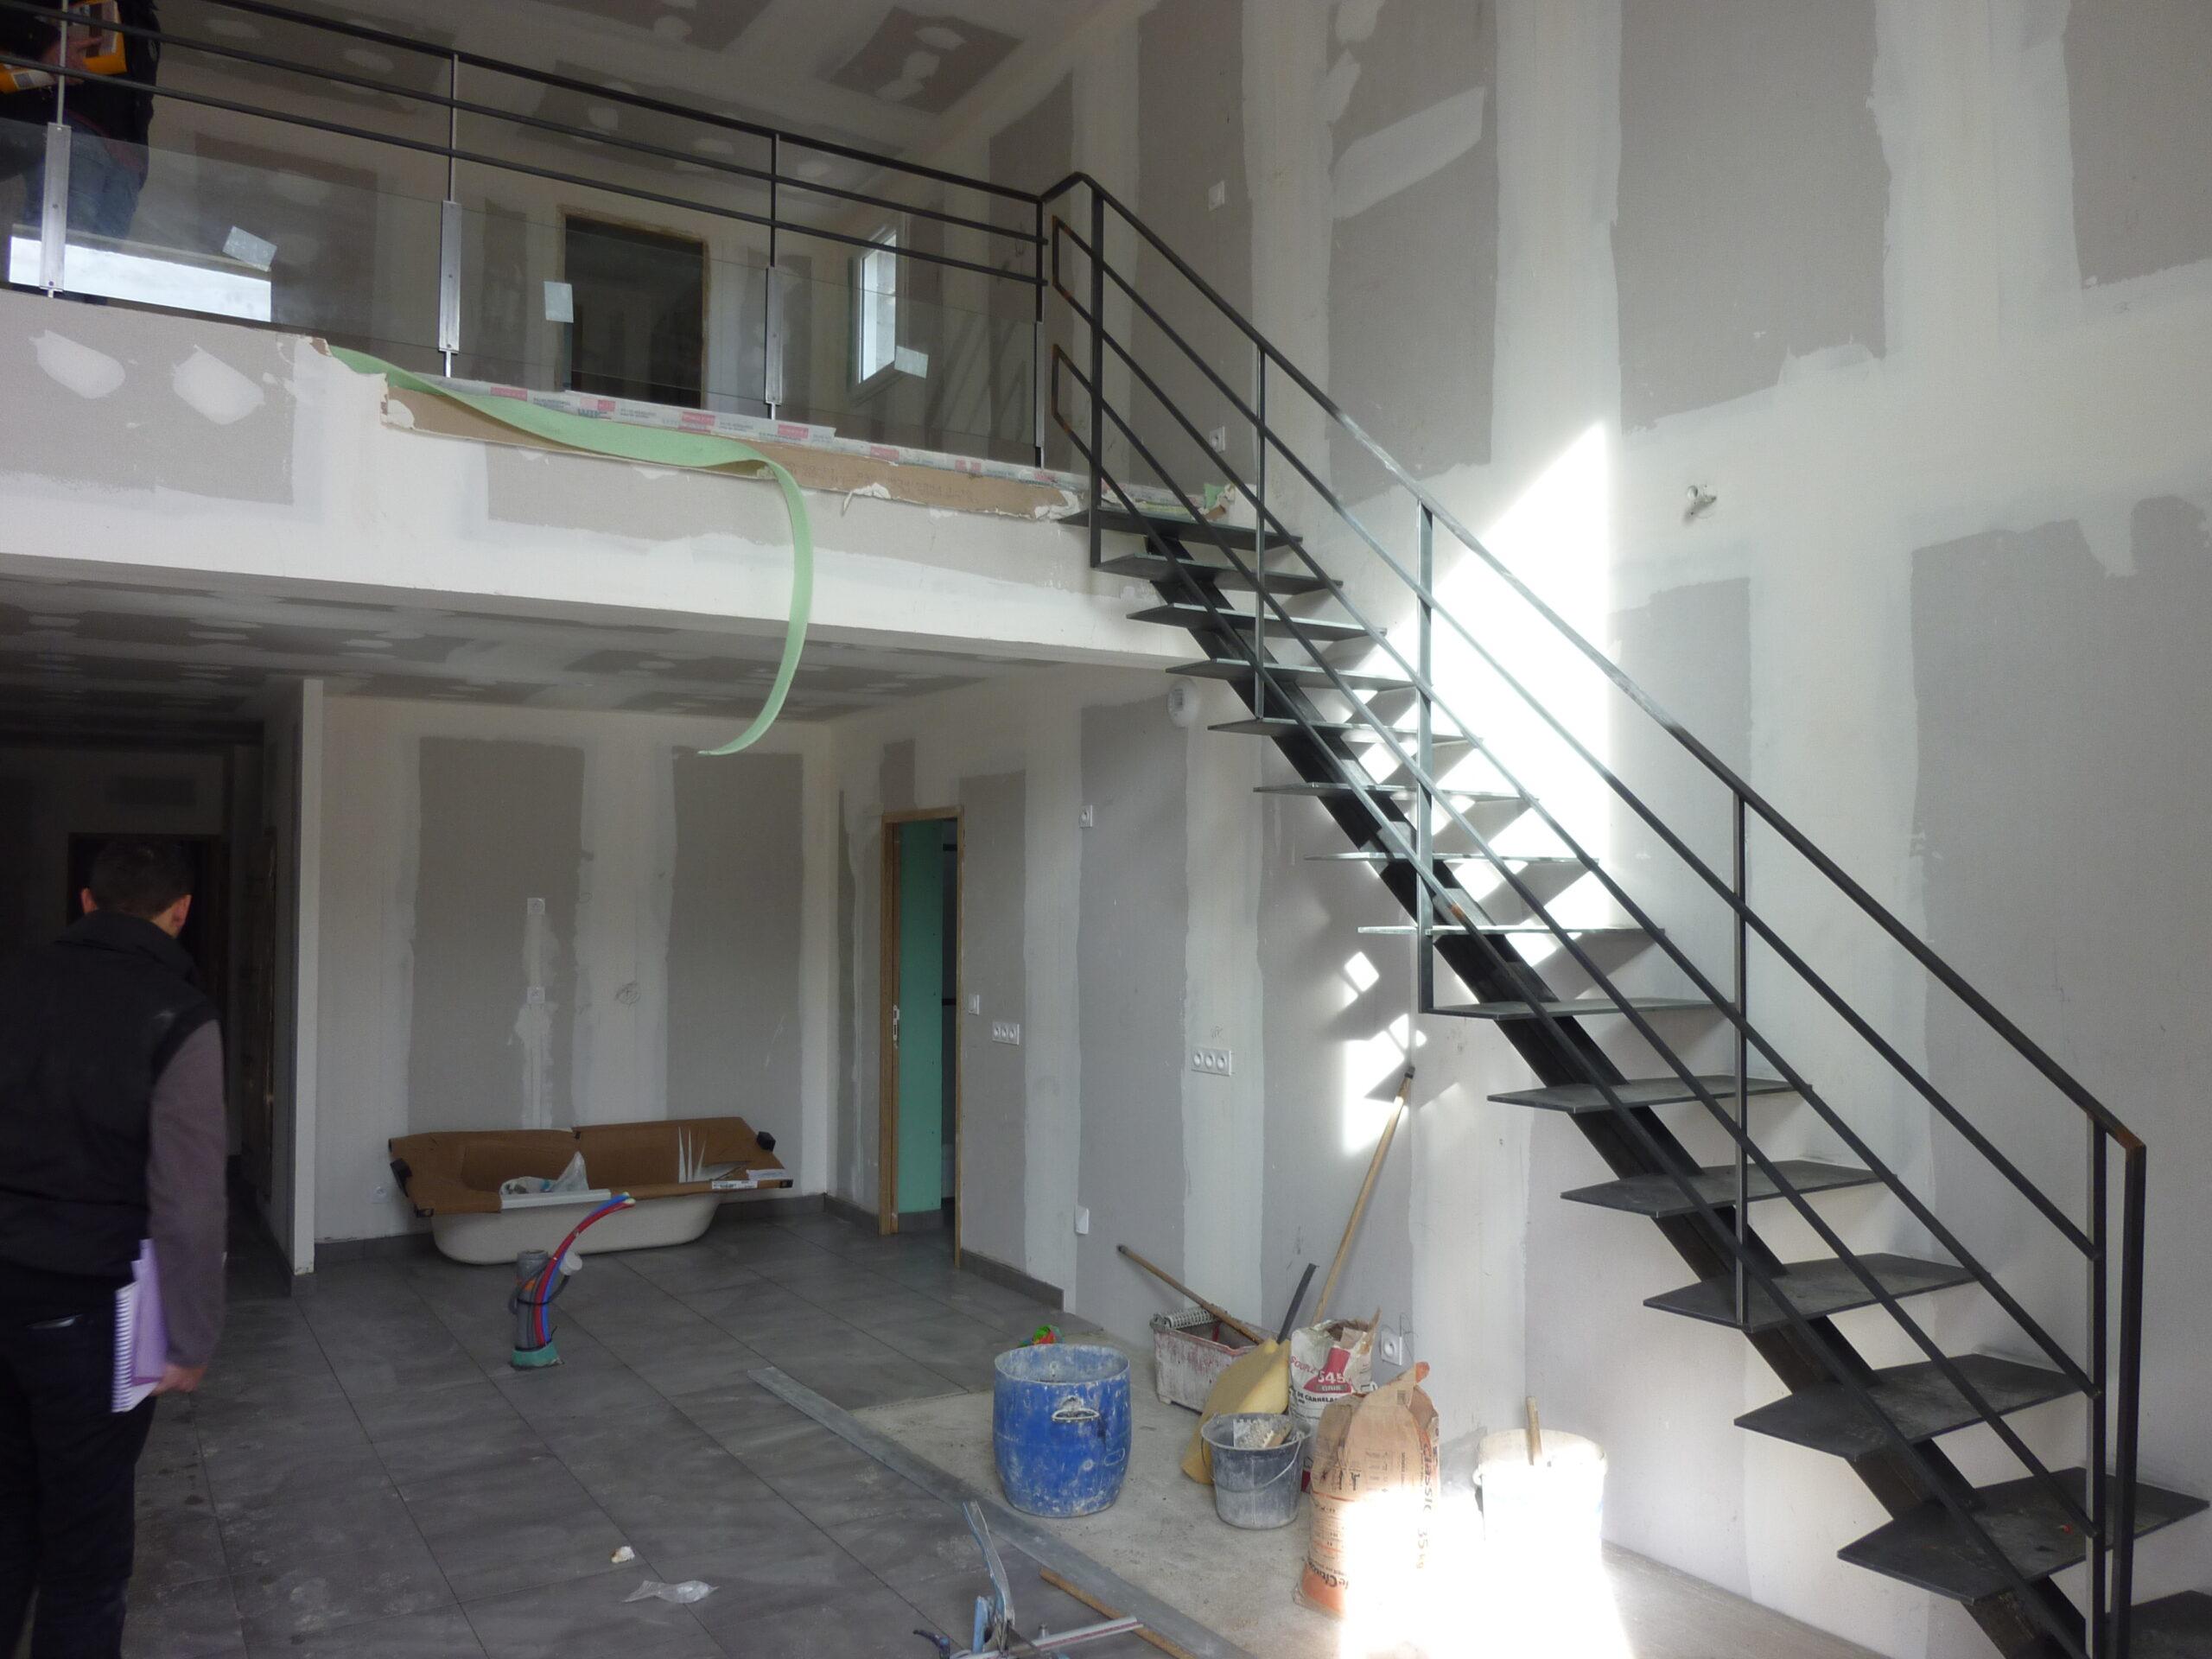 https://www.mon-artisan-ferronnier.com/wp-content/uploads/2021/04/escalier14-scaled.jpeg